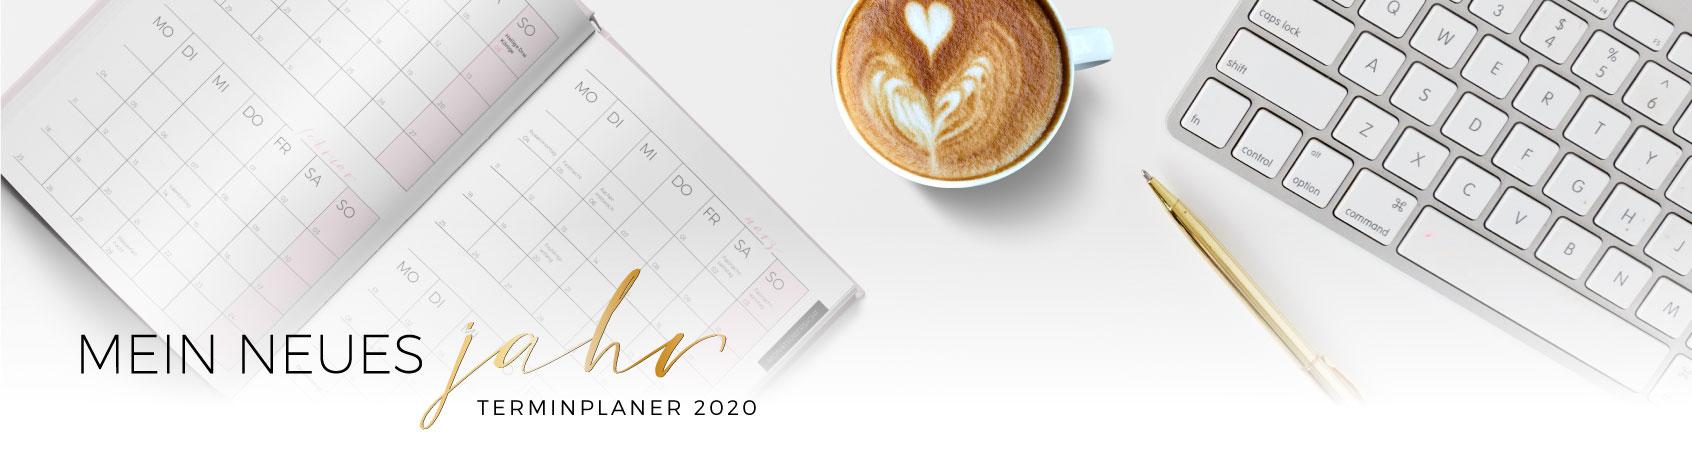 Terminplaner 2020 Nagelstudio A5